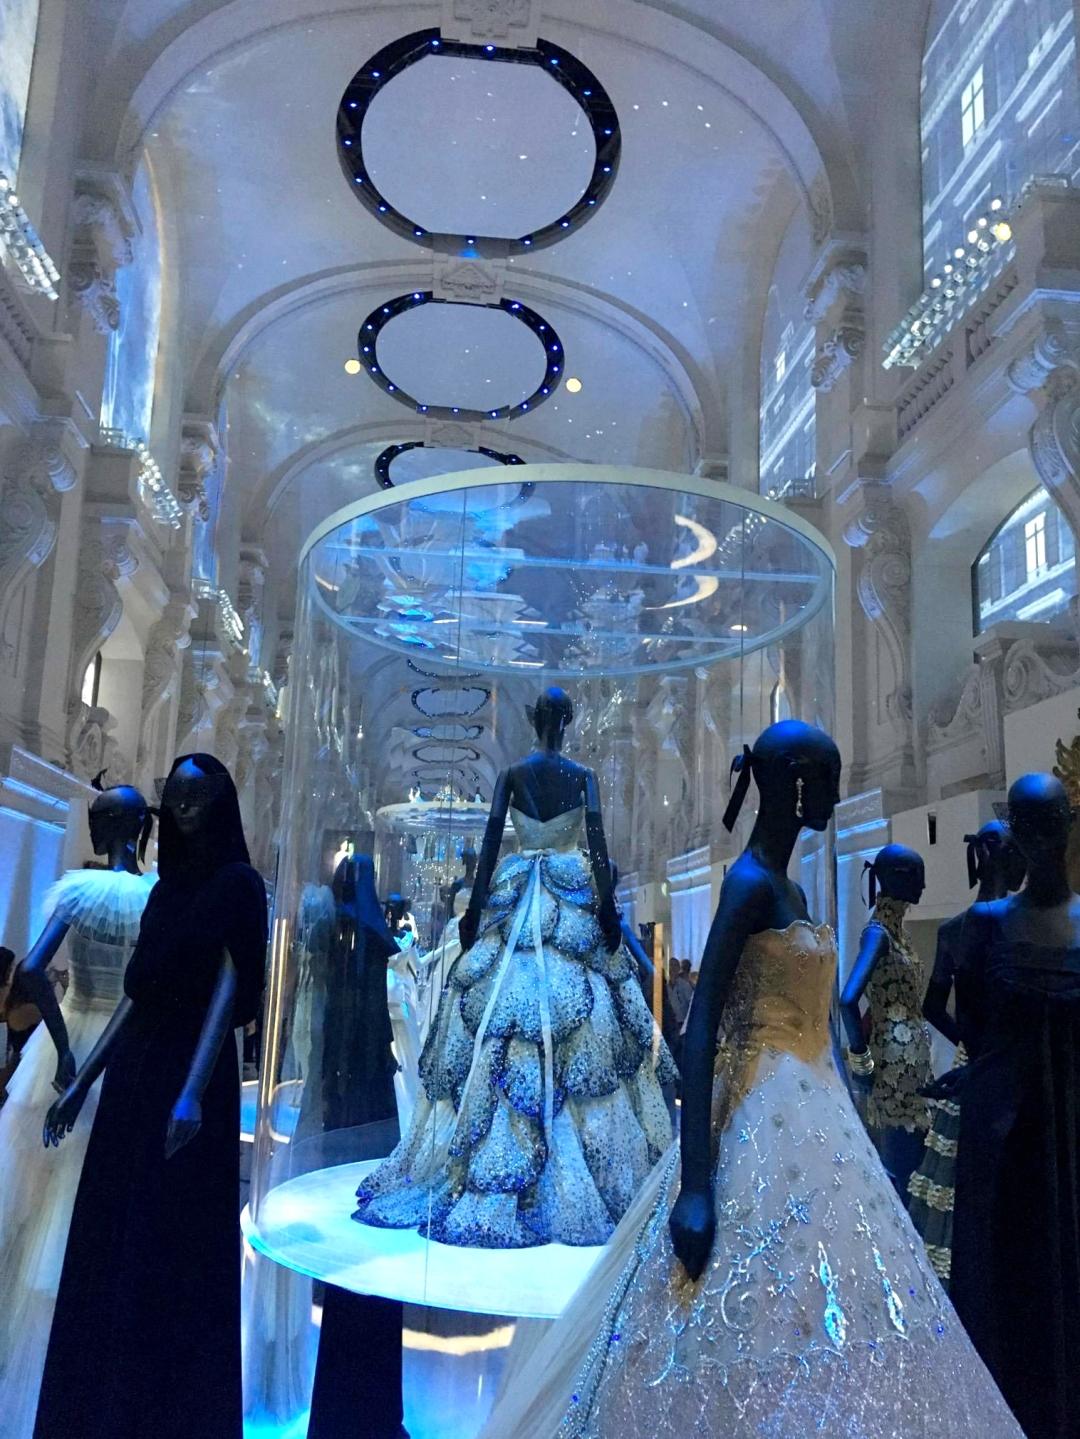 70 years Dior - Dior models - Dior dresses